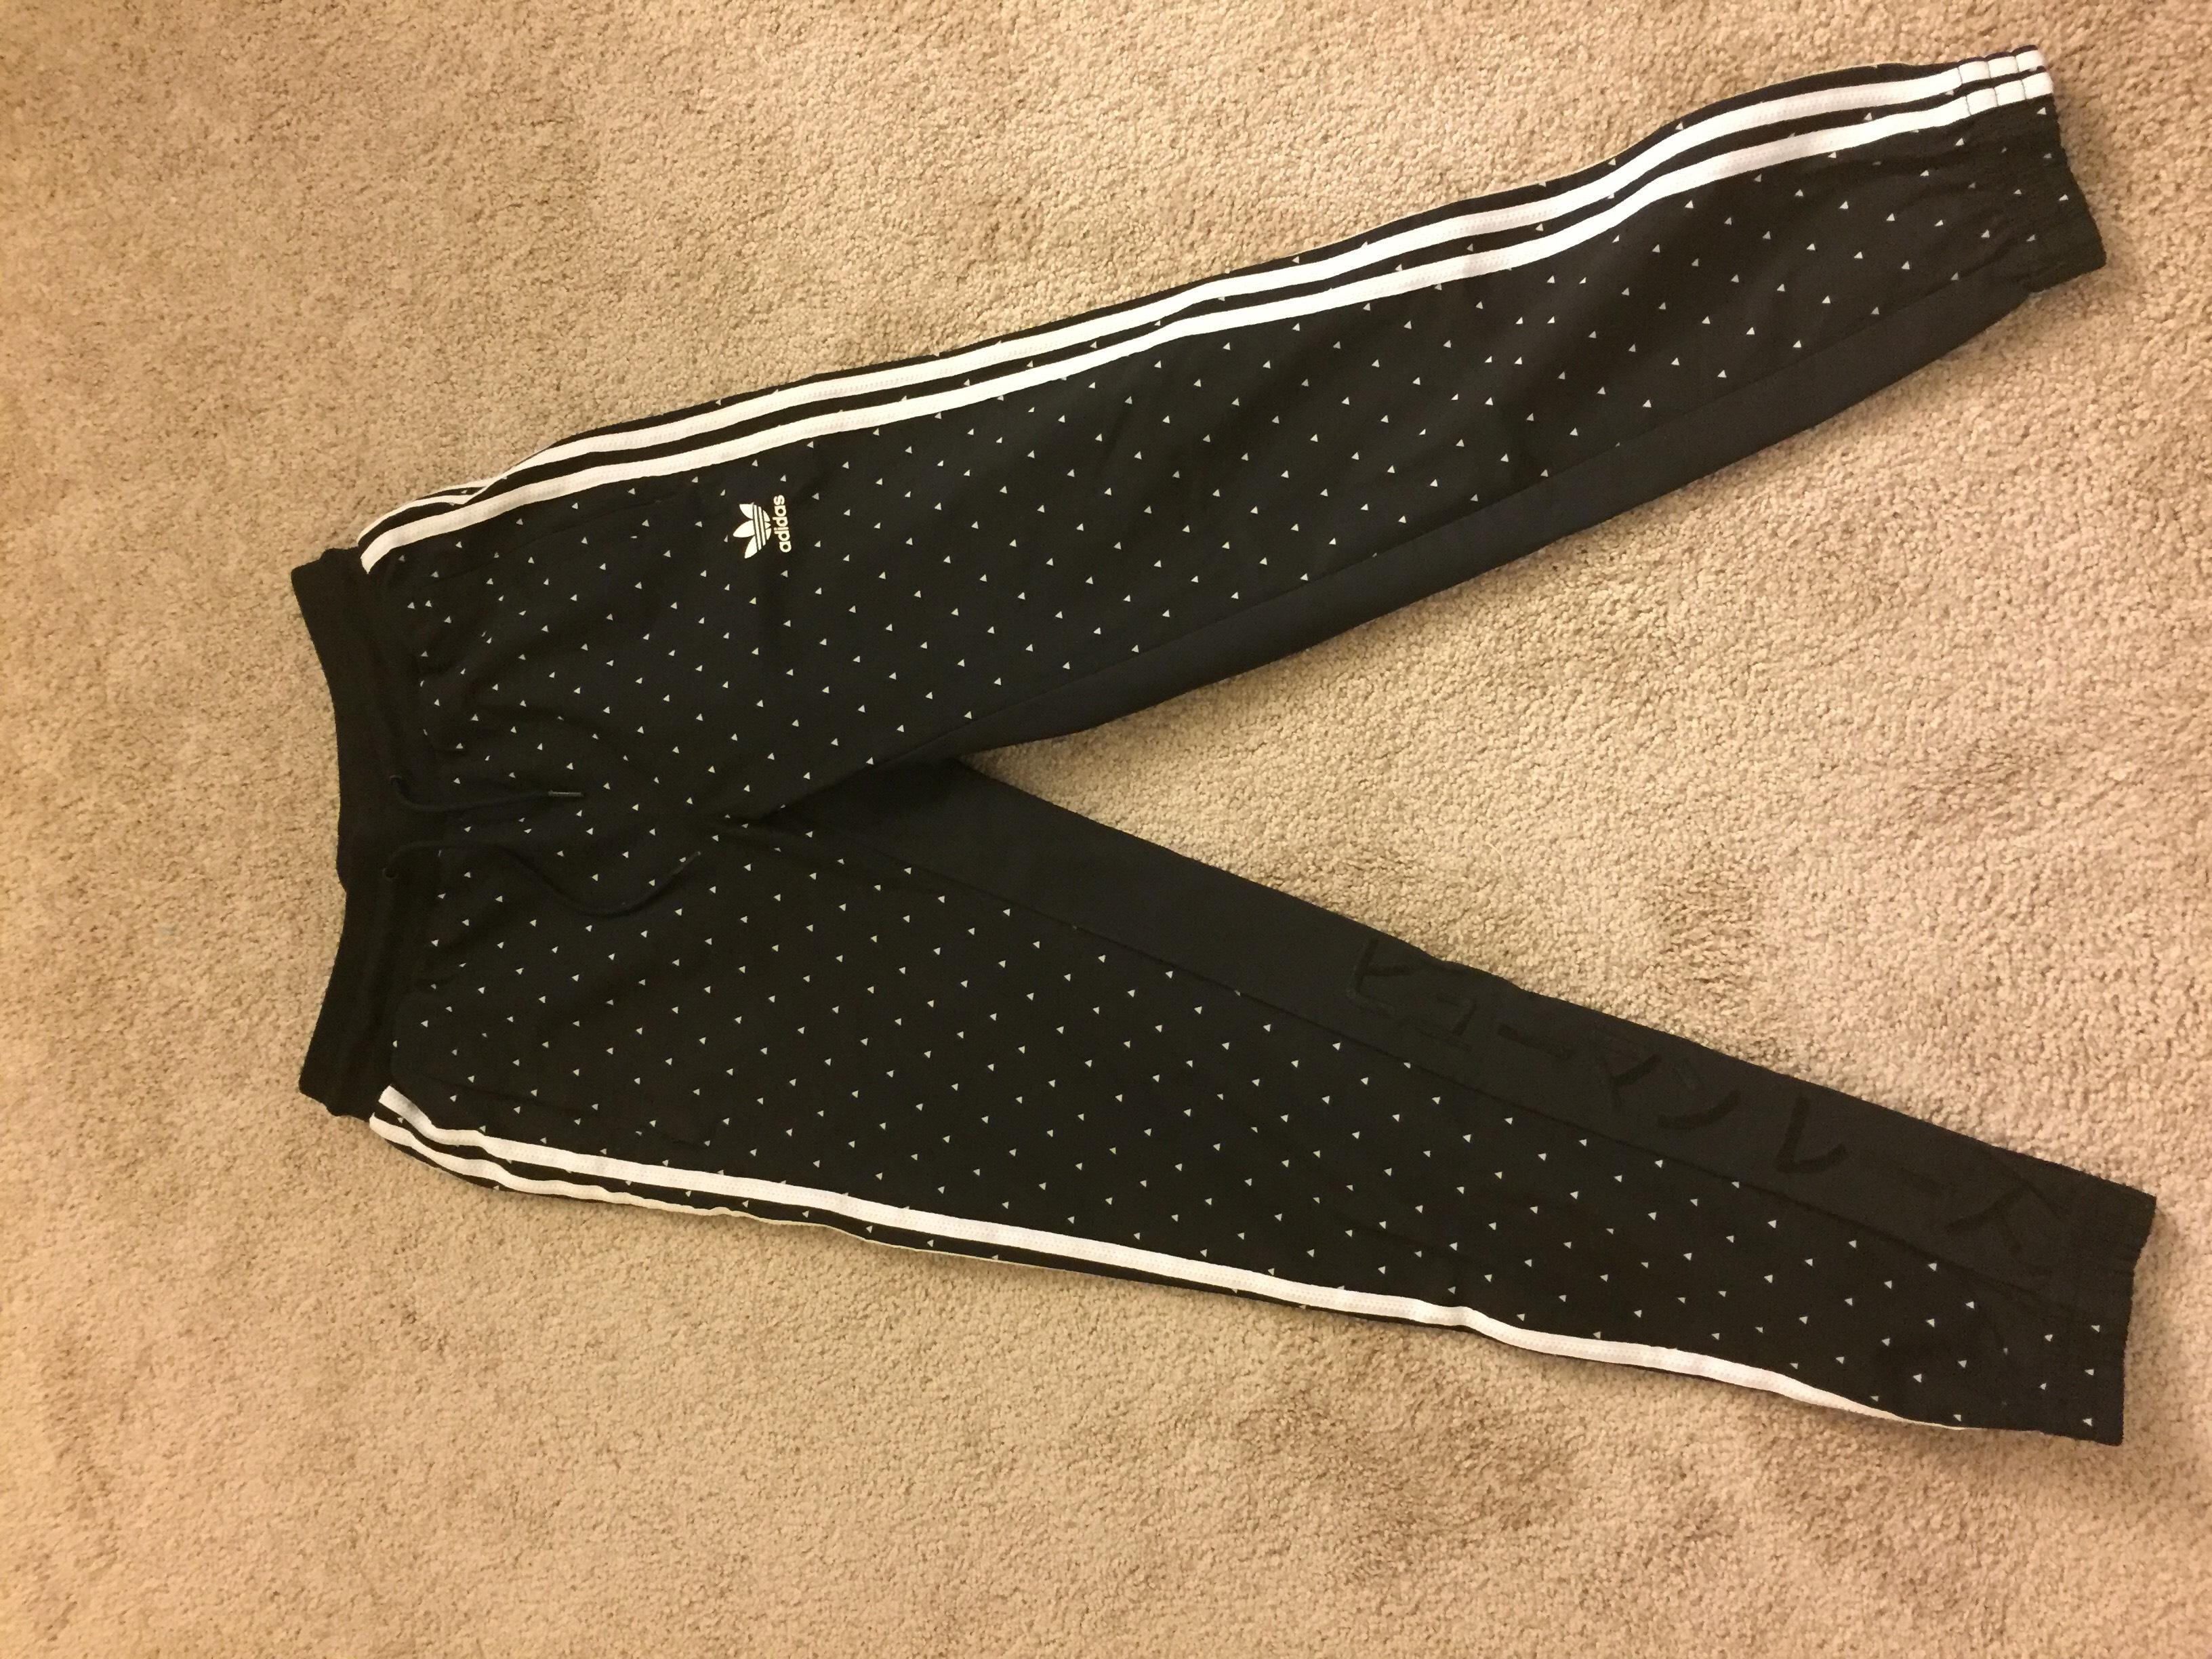 6b1ad687a2358 Adidas Adidas Pharrell Hu Carrot Pant Small Size 30 - Sweatpants   Joggers  for Sale - Grailed